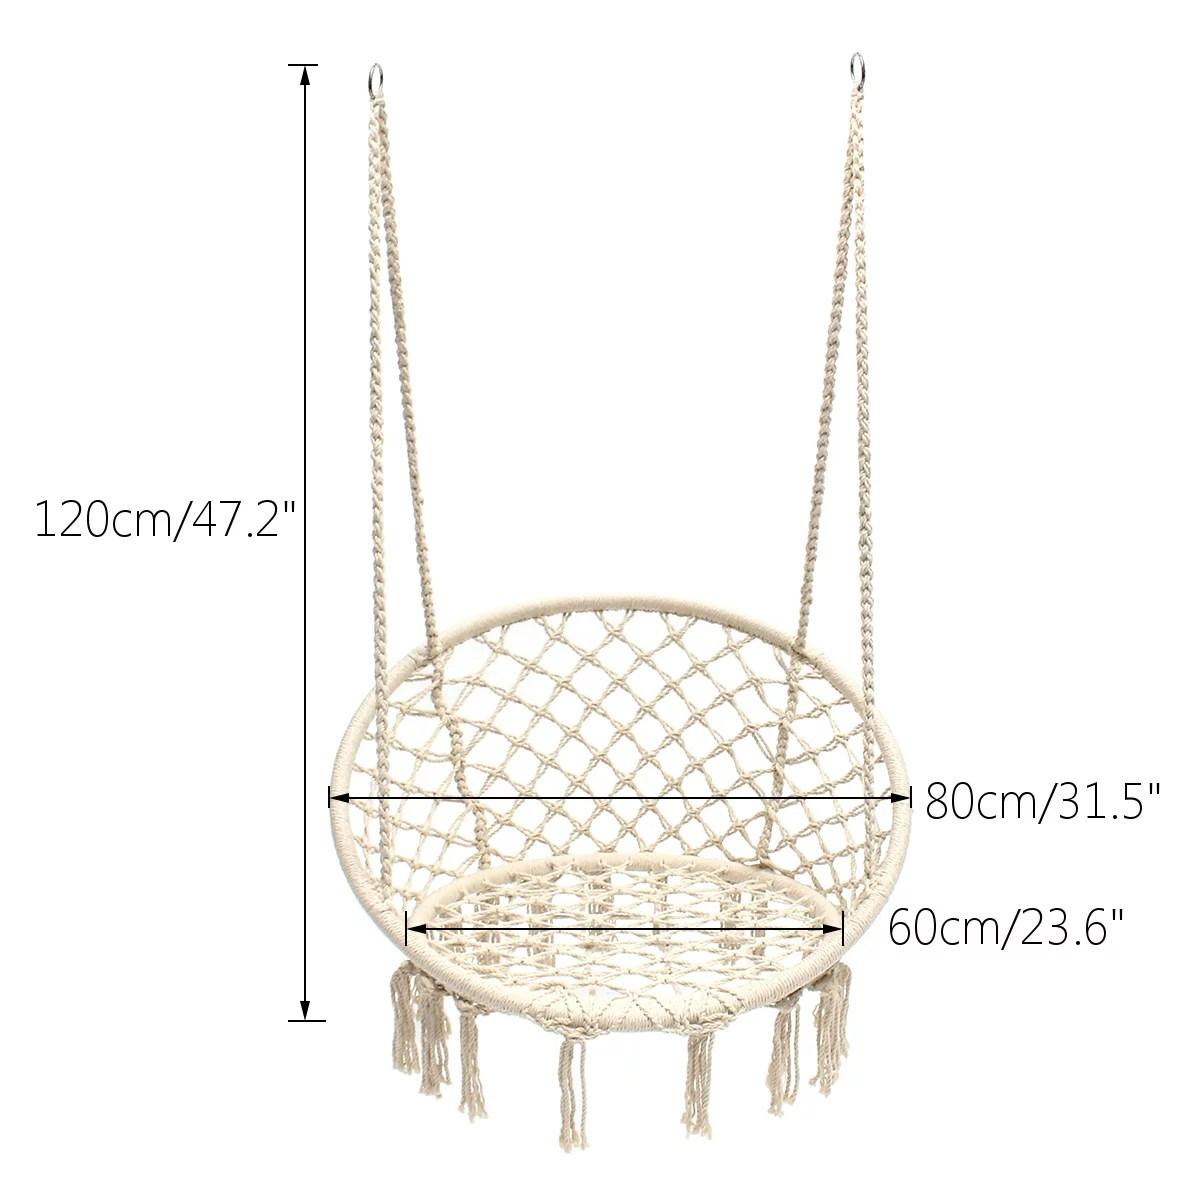 Hanging Chair Dimensions Facingwalls